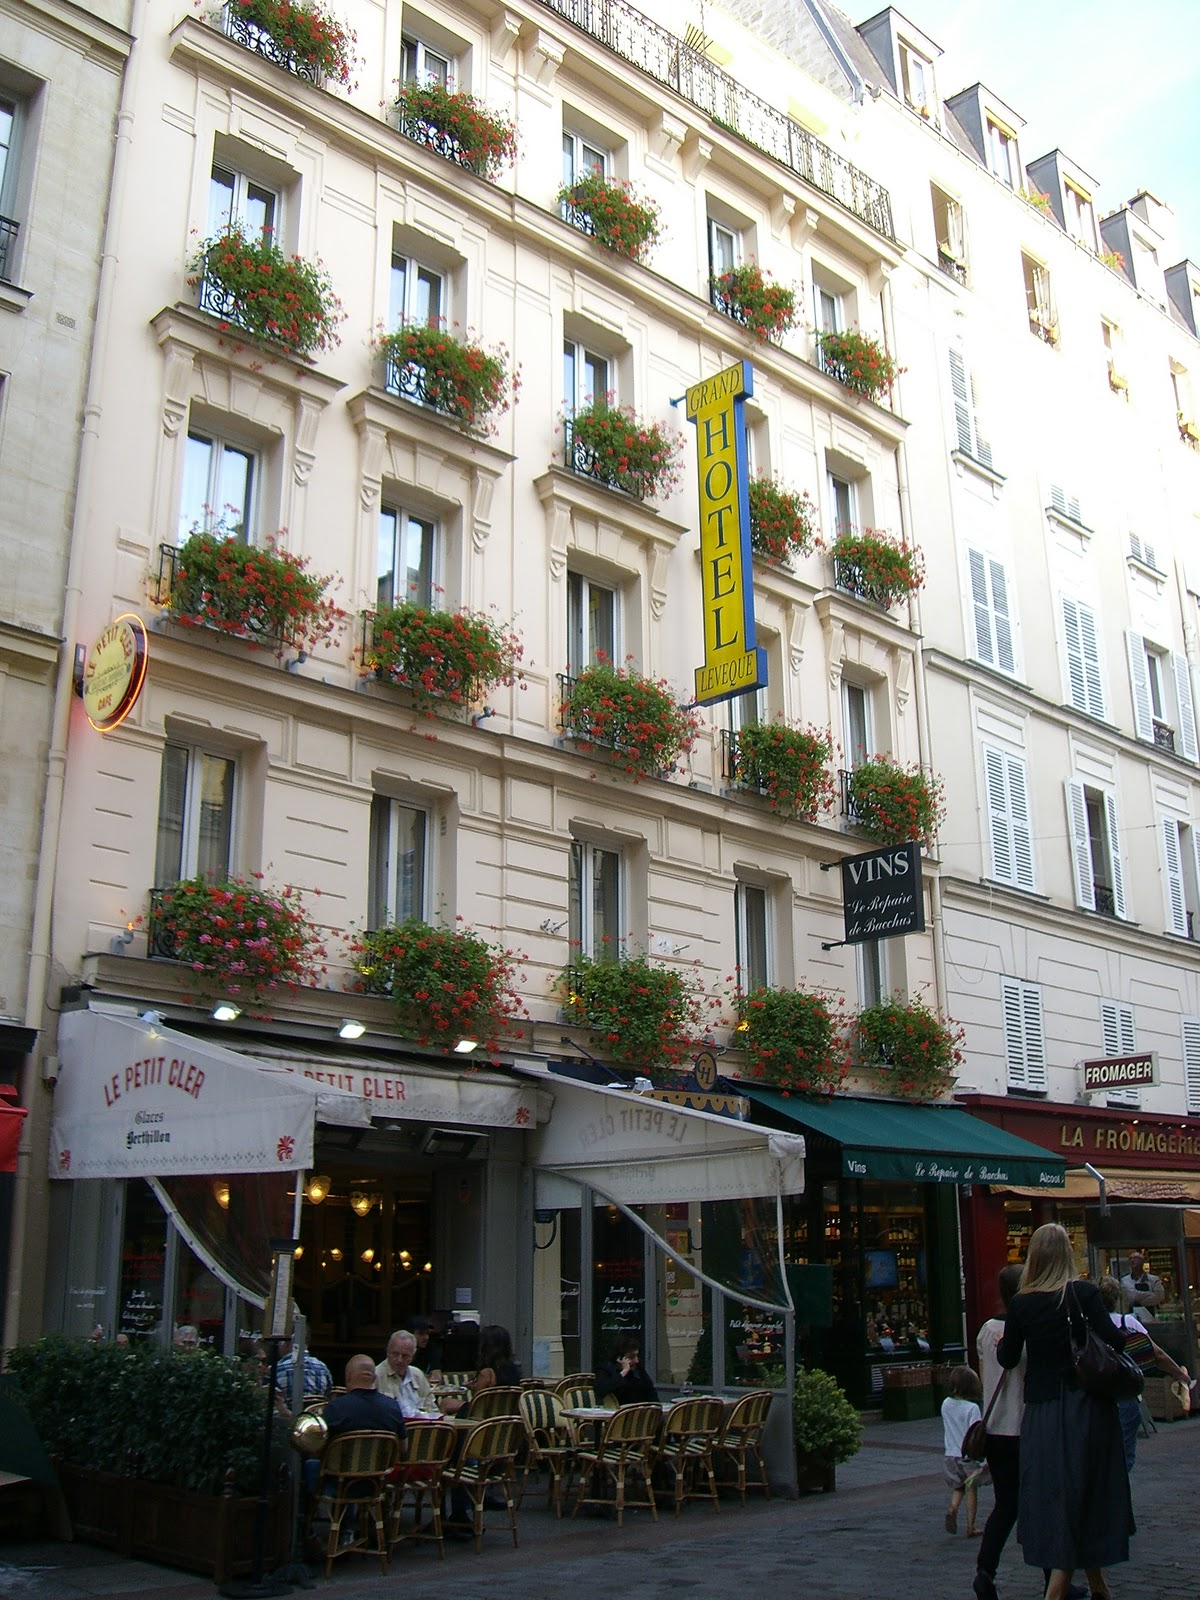 Paris trip the grand hotel leveque for Cler hotel paris